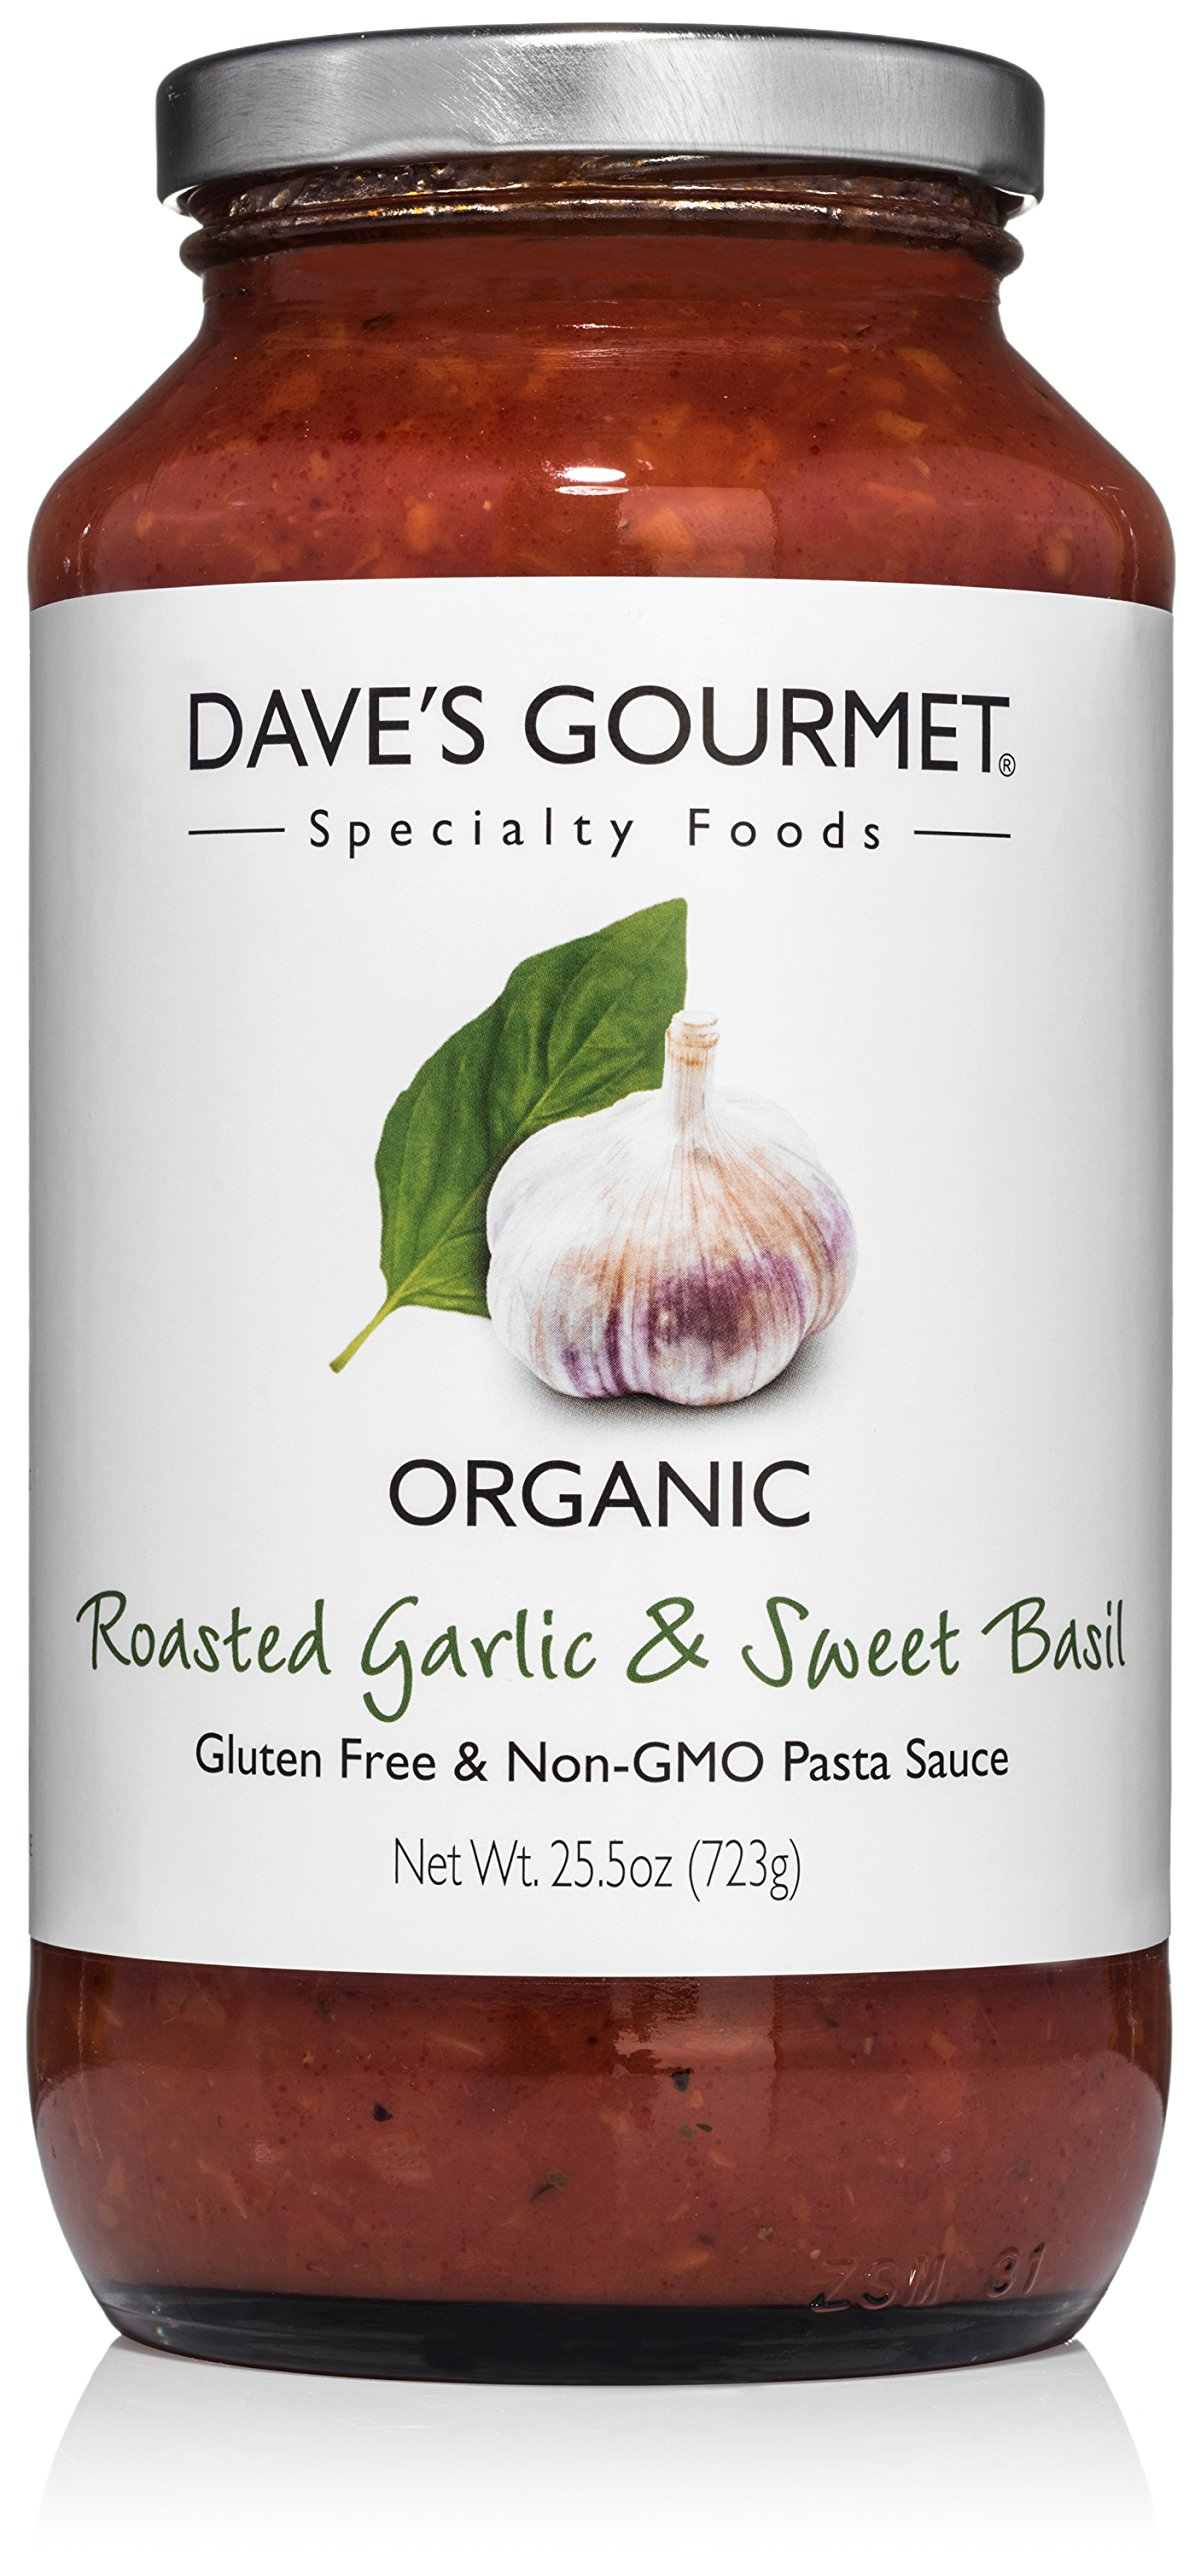 Dave's Gourmet Organic Roasted Garlic and Sweet Basil Pasta Sauce, Pack of 3